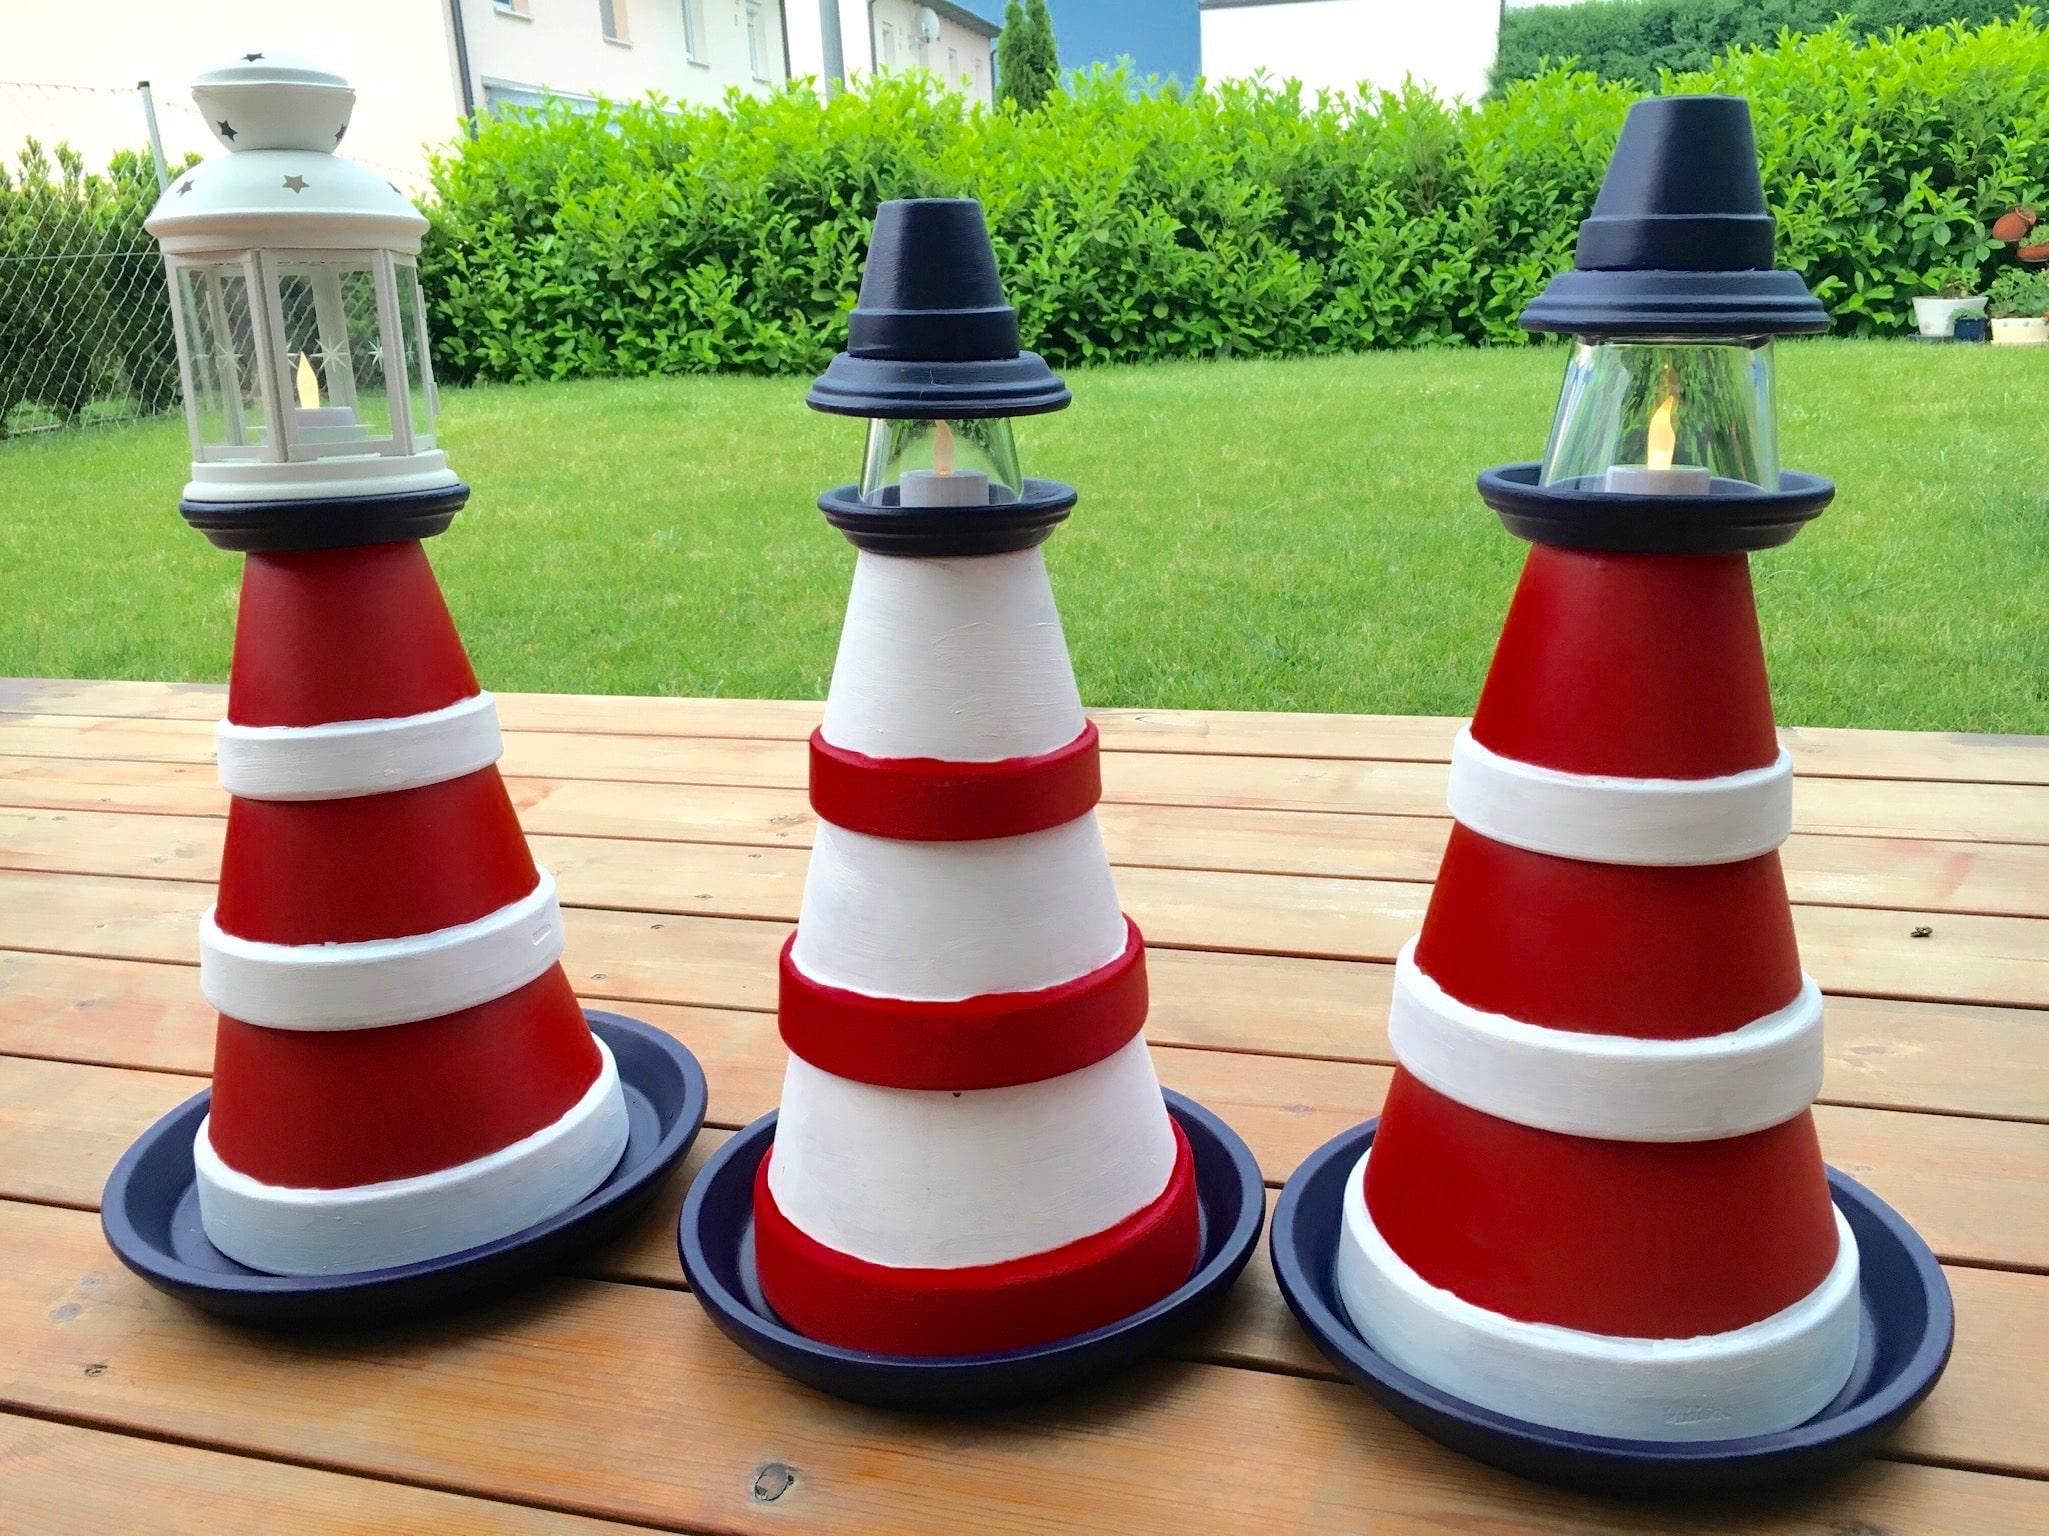 Garten diy zum sommerbeginn bauen wir einen leuchtturm for Leuchtturm basteln